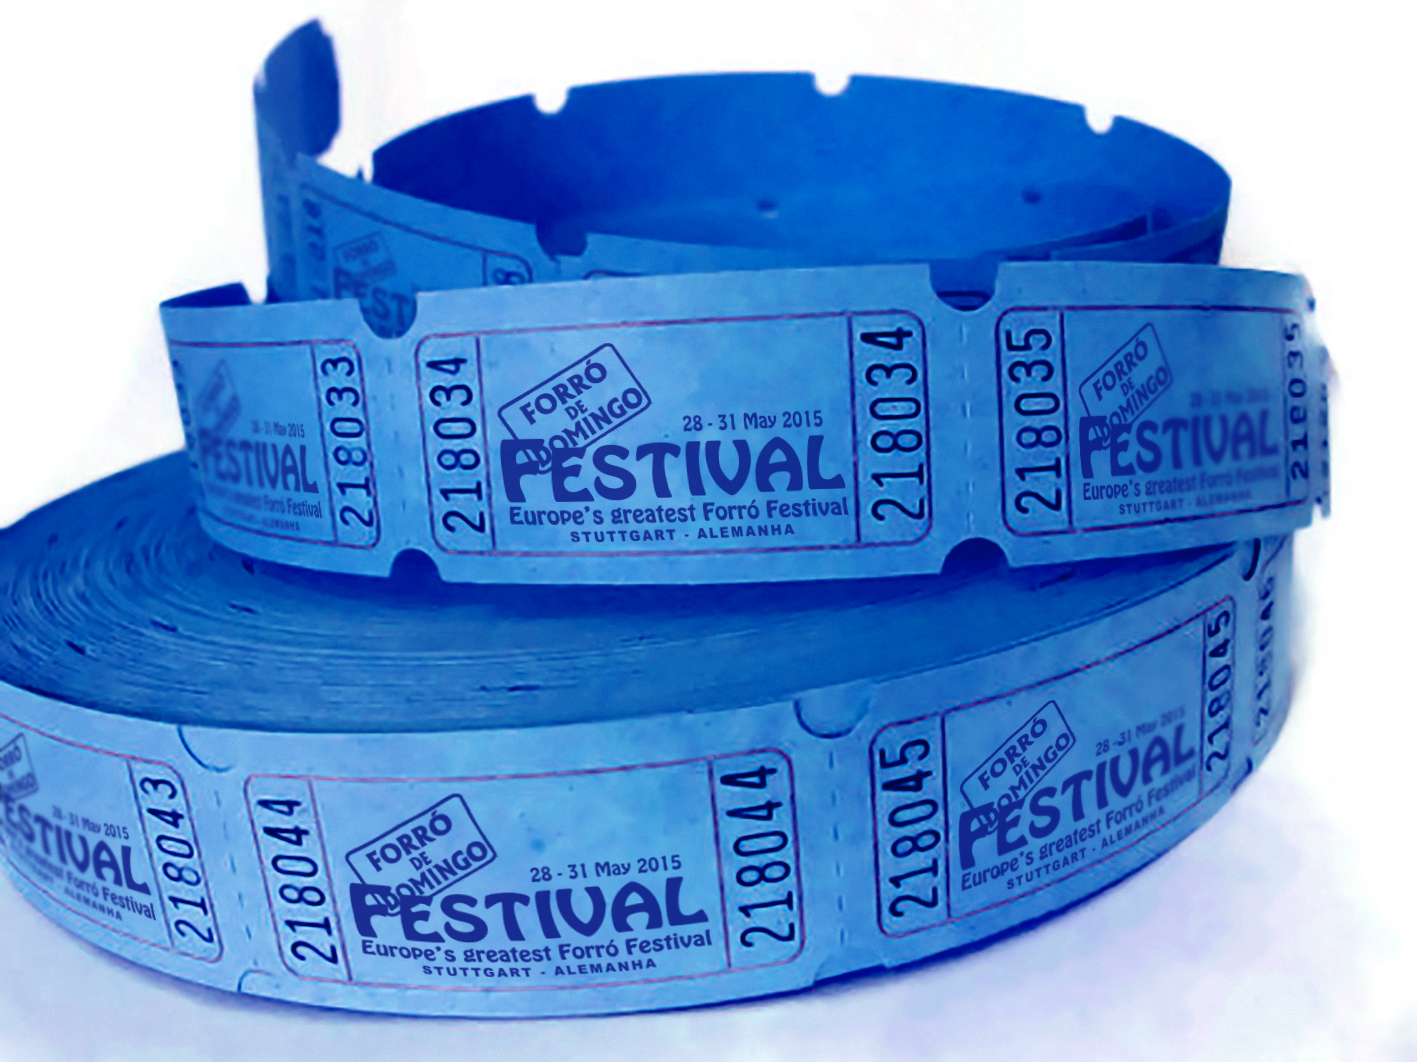 http://forrofestival.com/wp-content/uploads/2015/02/FdD-ticket_3-dias.jpg